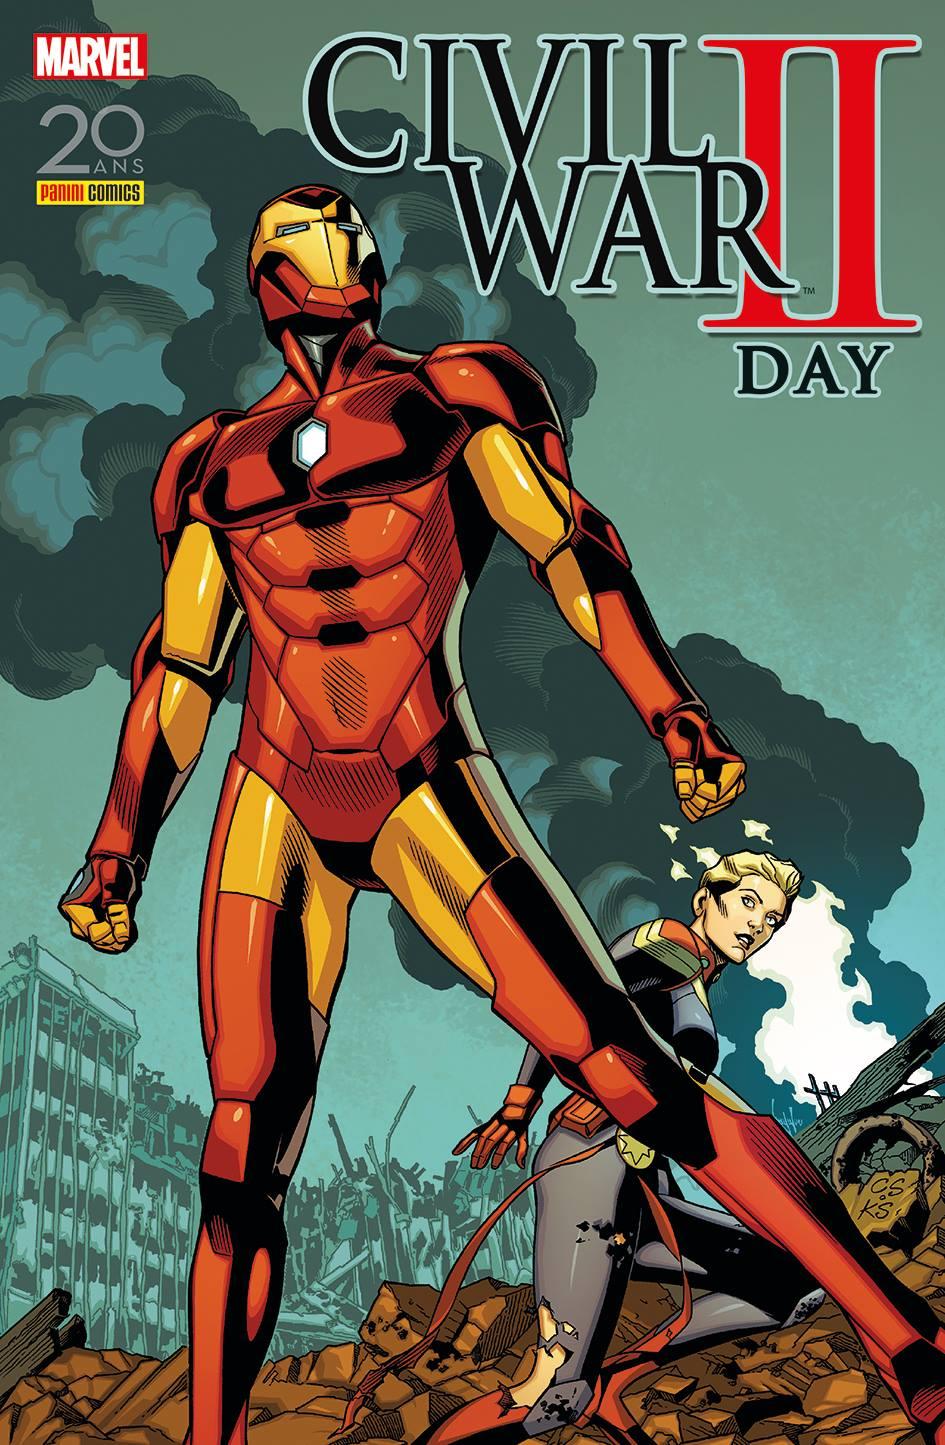 CIVIL WAR II DAY